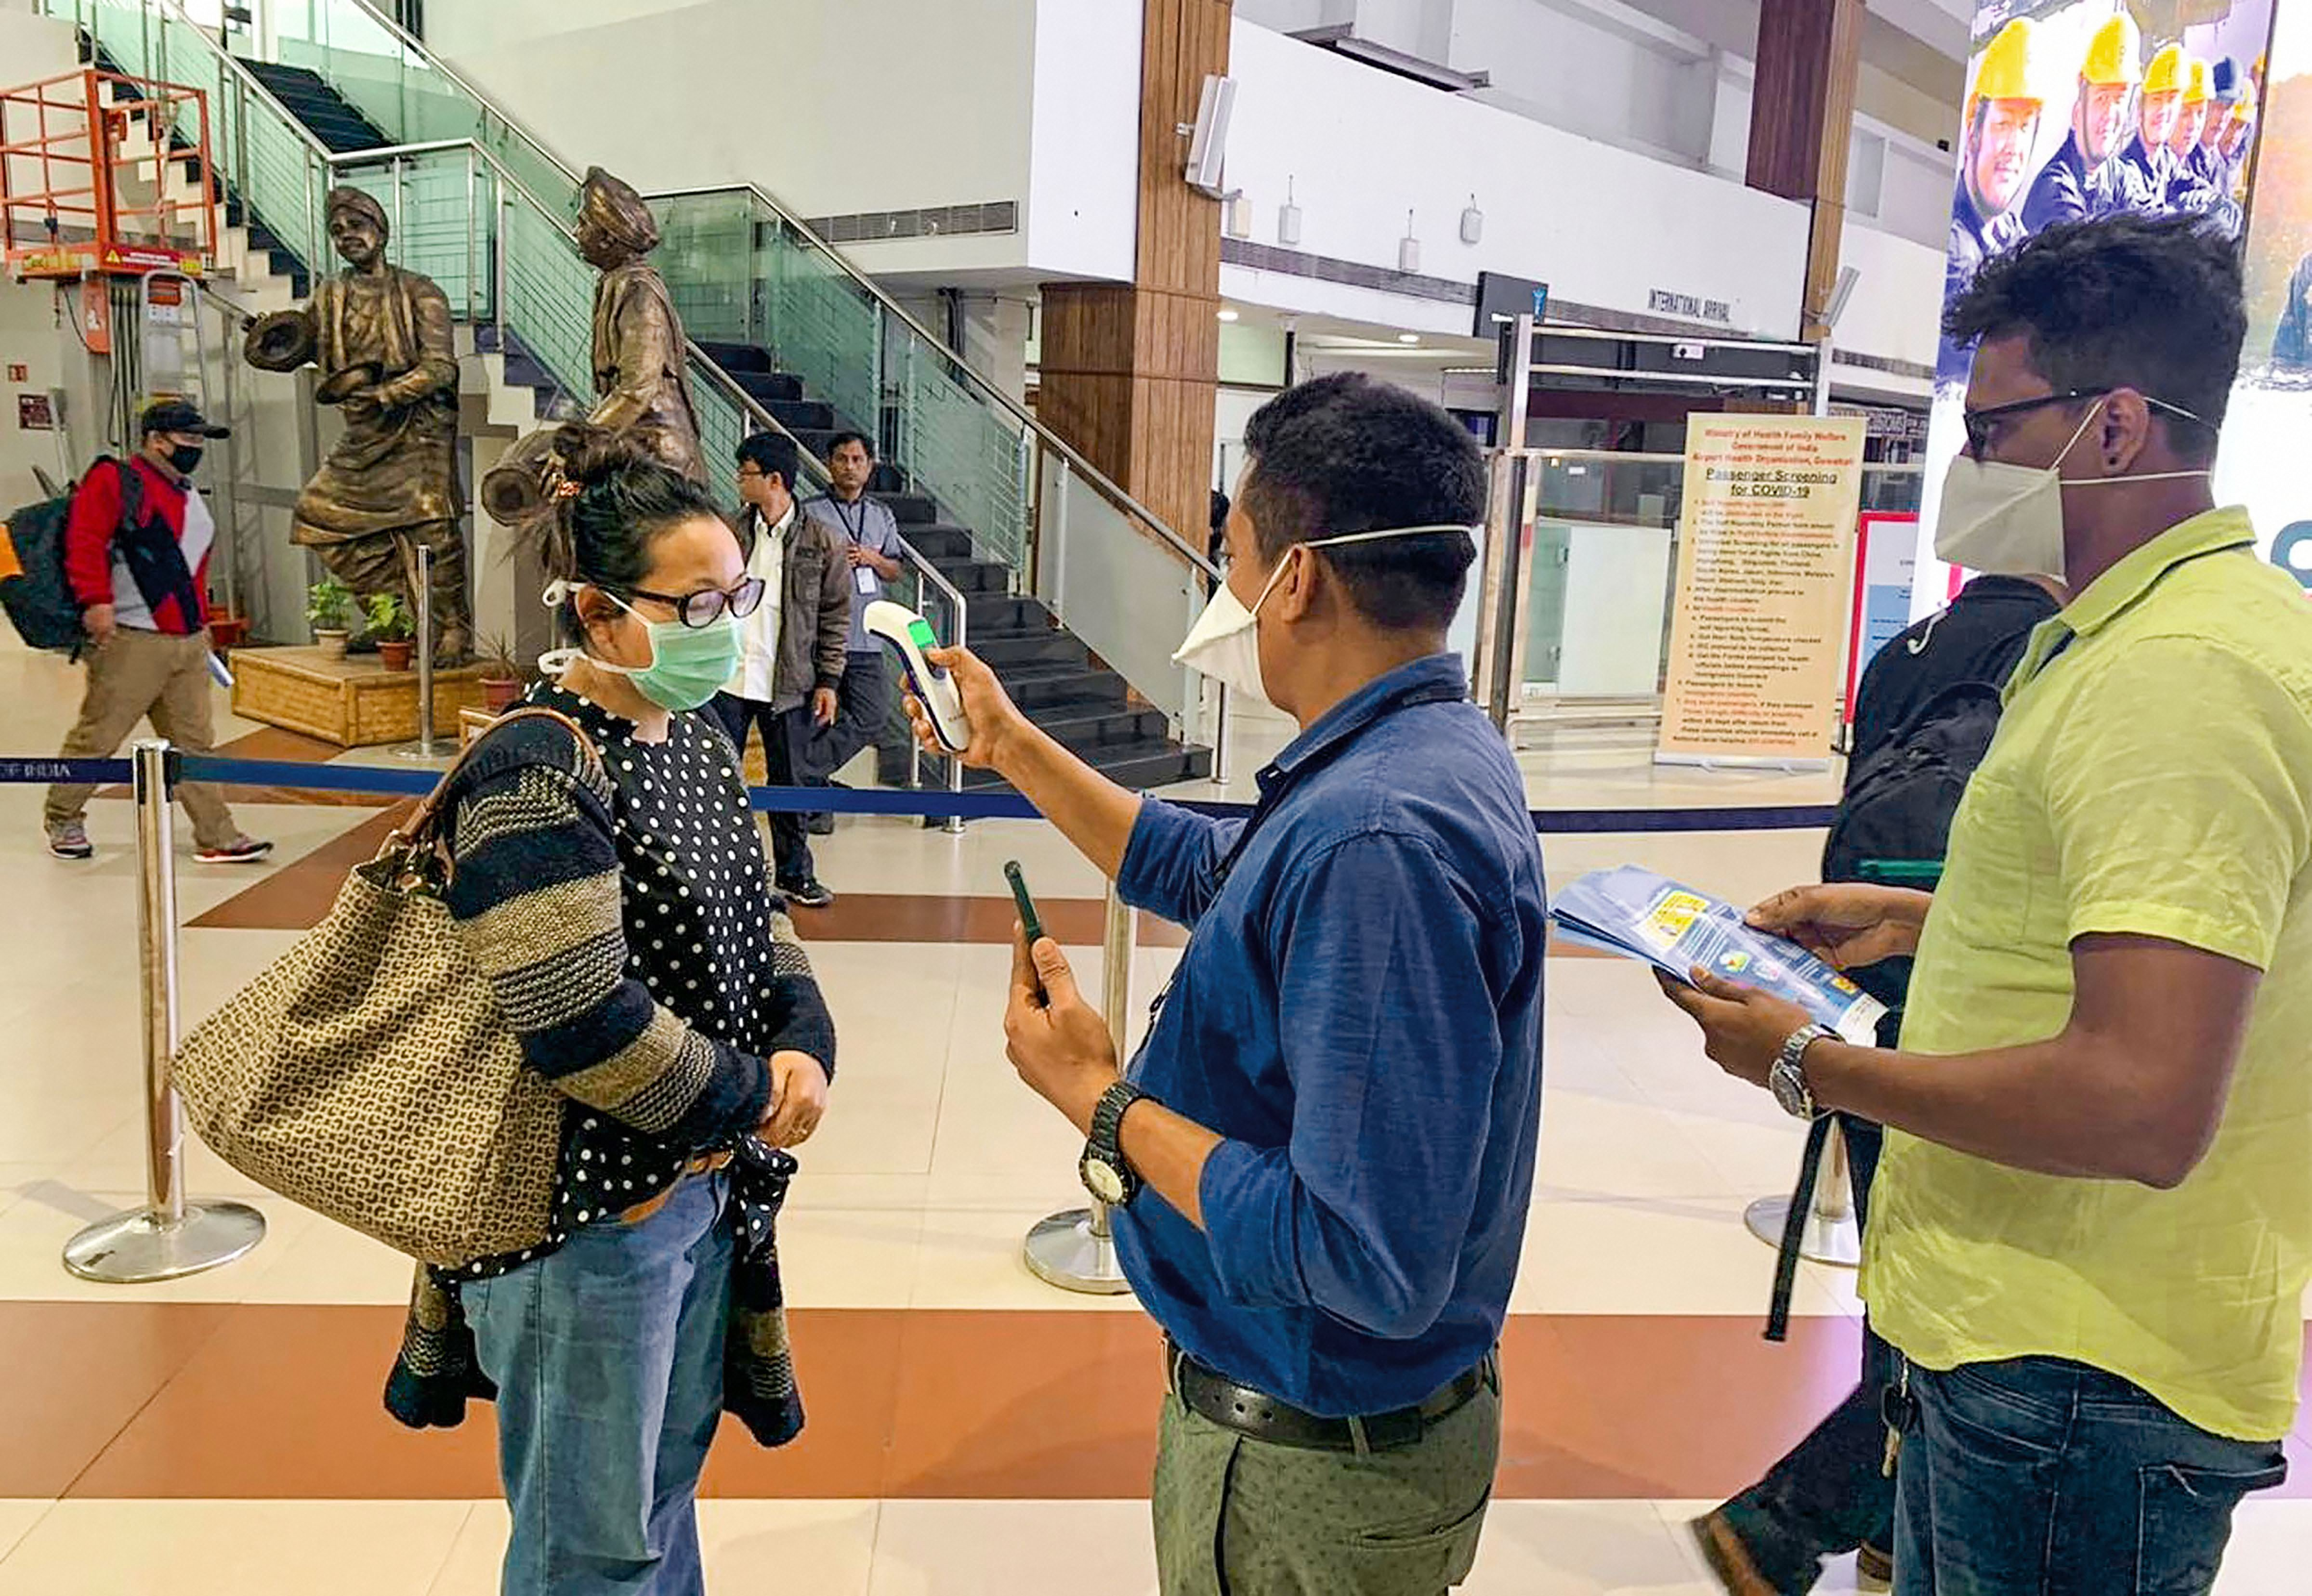 Passengers undergo a thermal screening test in the wake of novel coronavirus scare at Lokpriya Gopinath Bordoloi International Airport in Guwahati, Monday, March 9, 2020